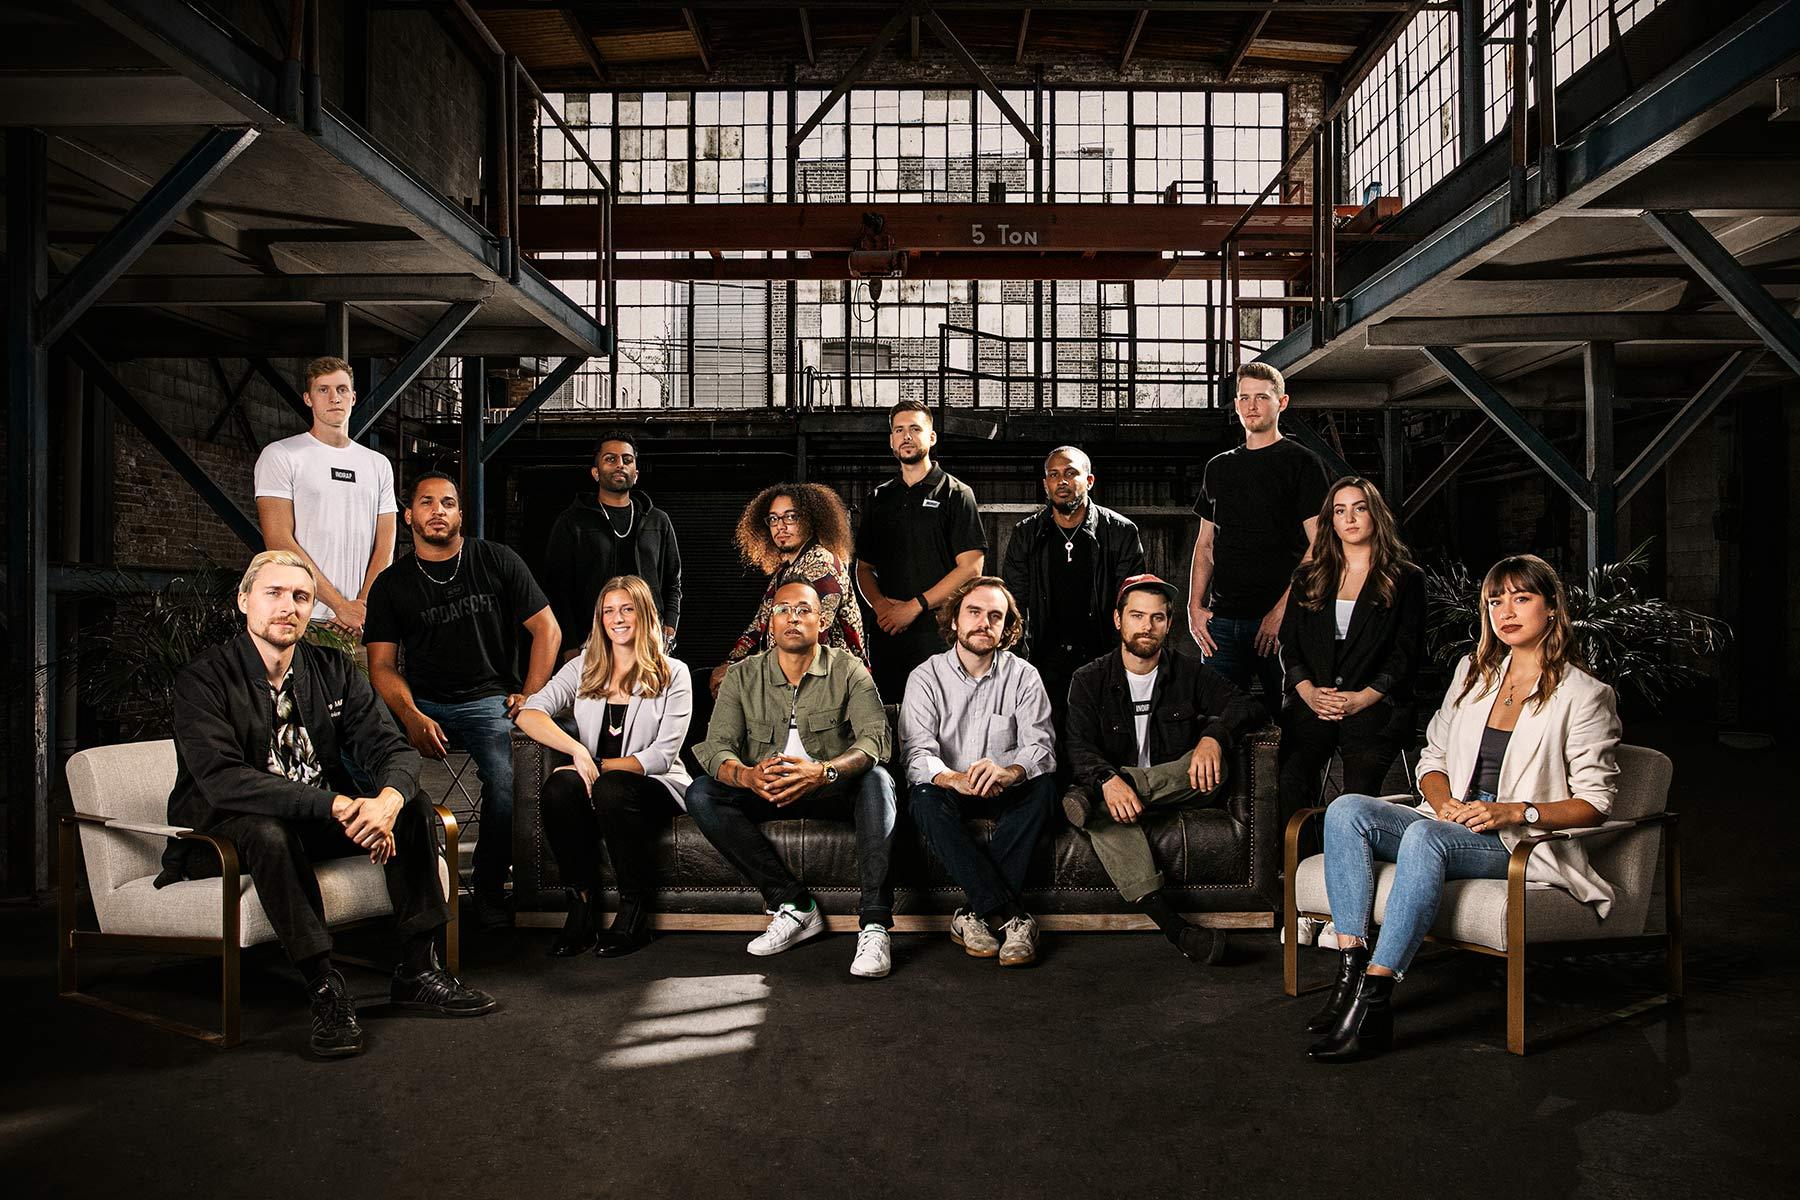 Chicago Videography Team - Indirap